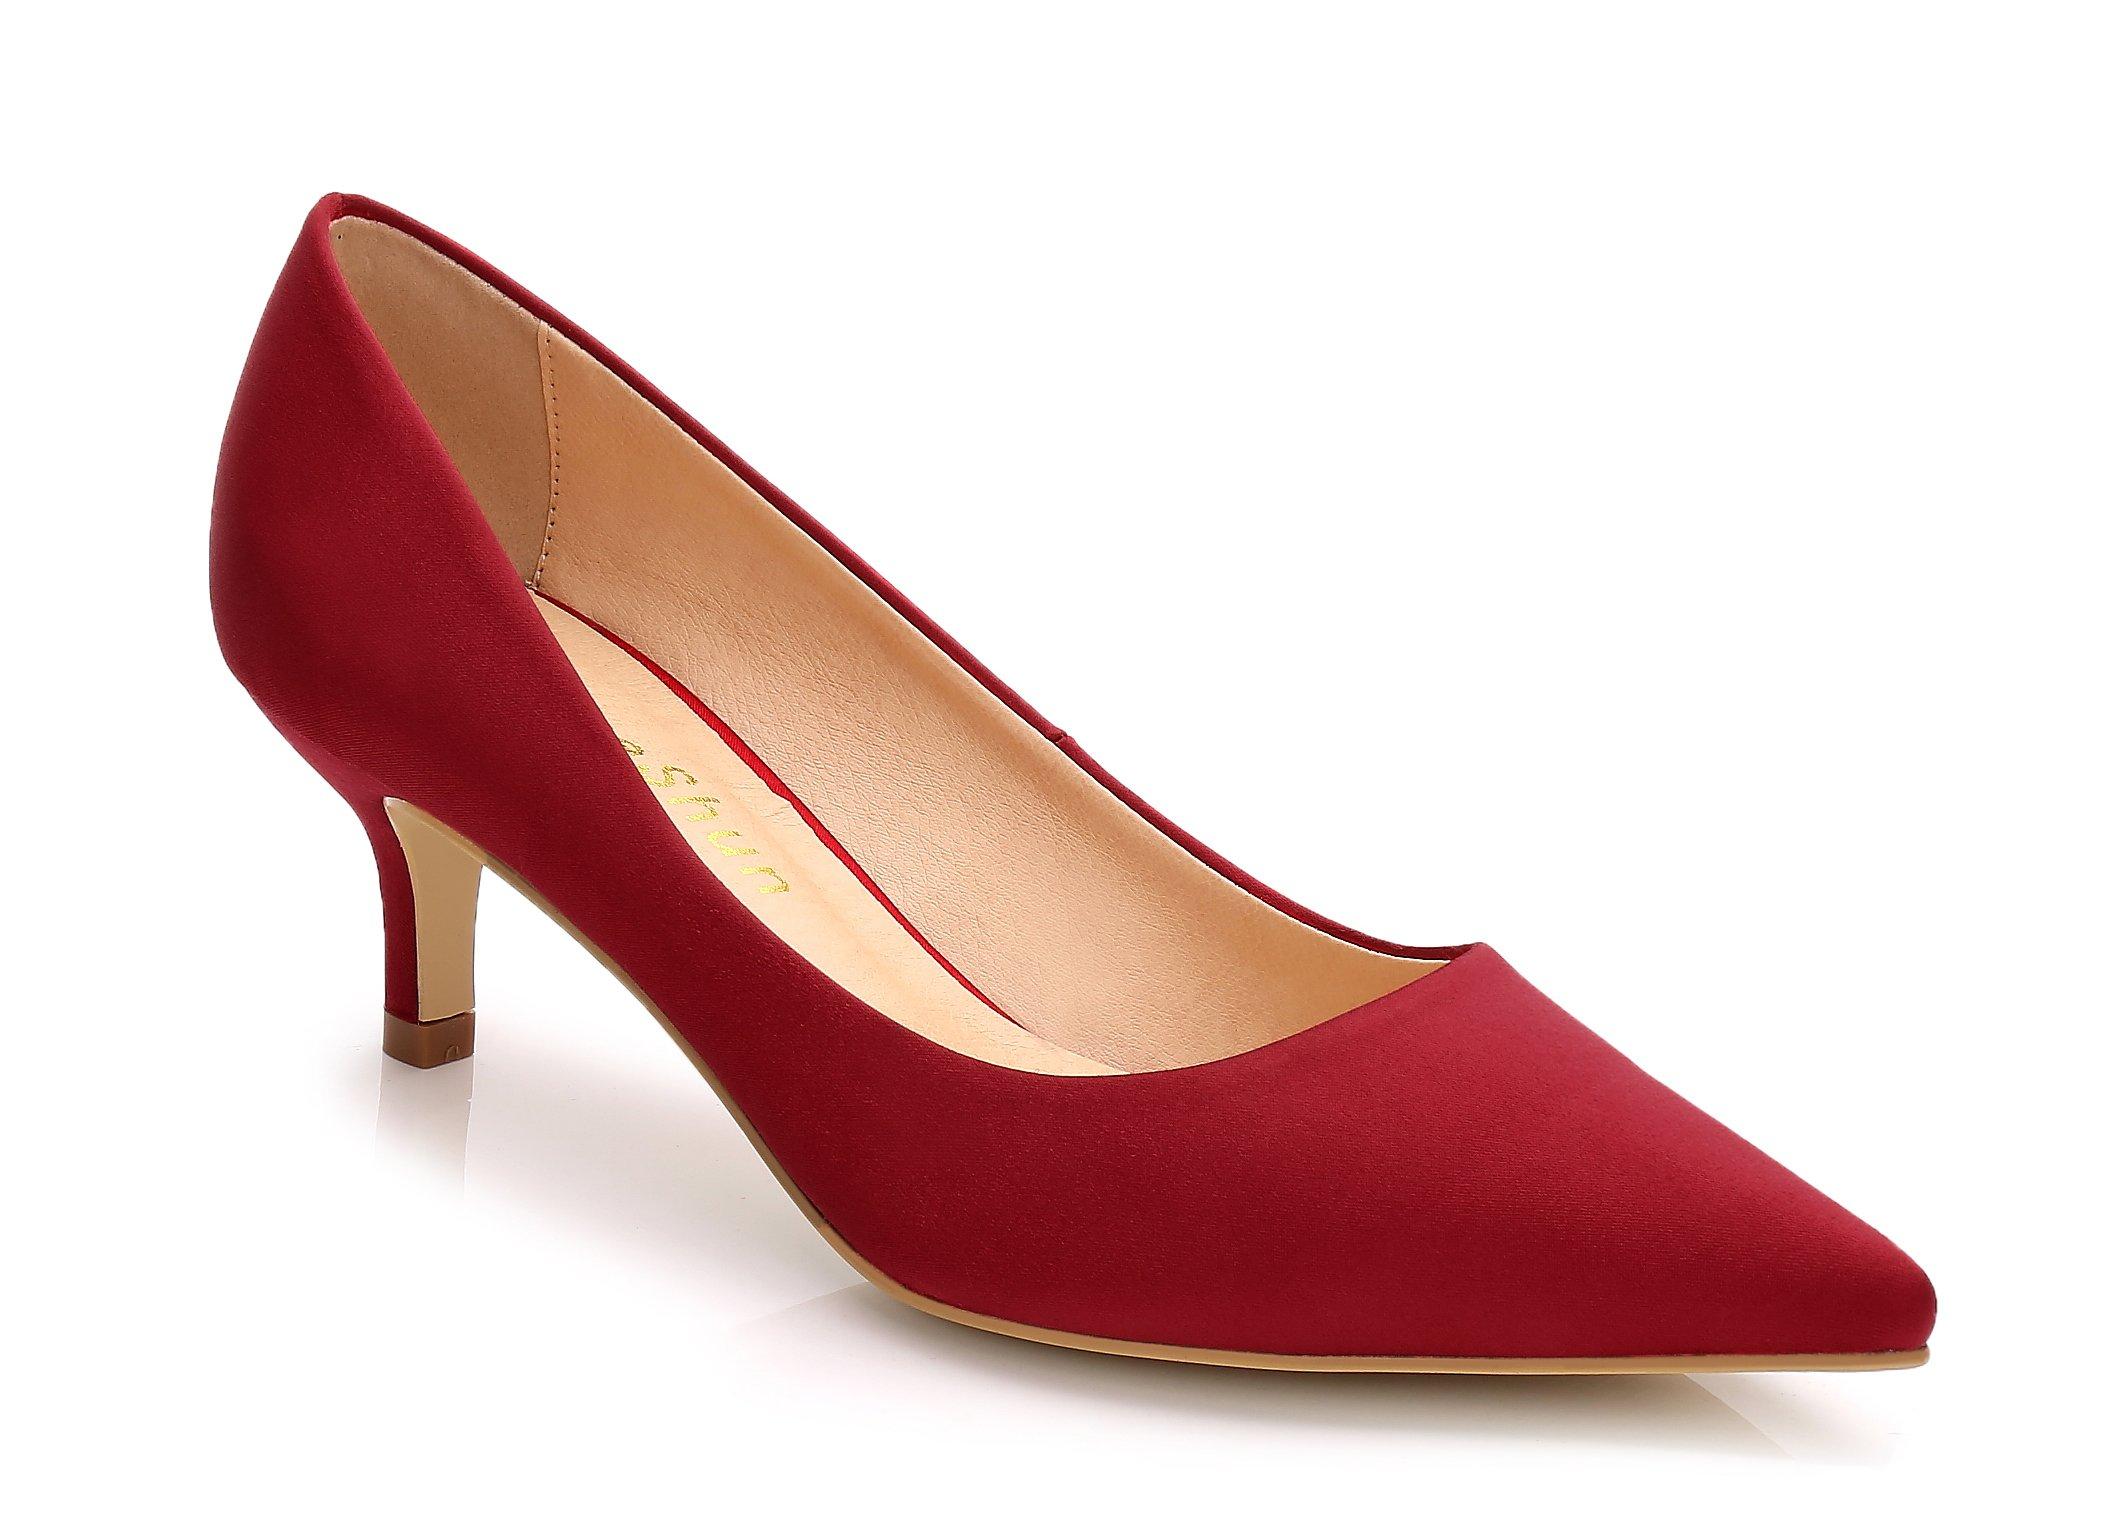 ComeShun Womens Shoes Red Slip On Kitten Comfort Kitten Heels Pumps Size 8